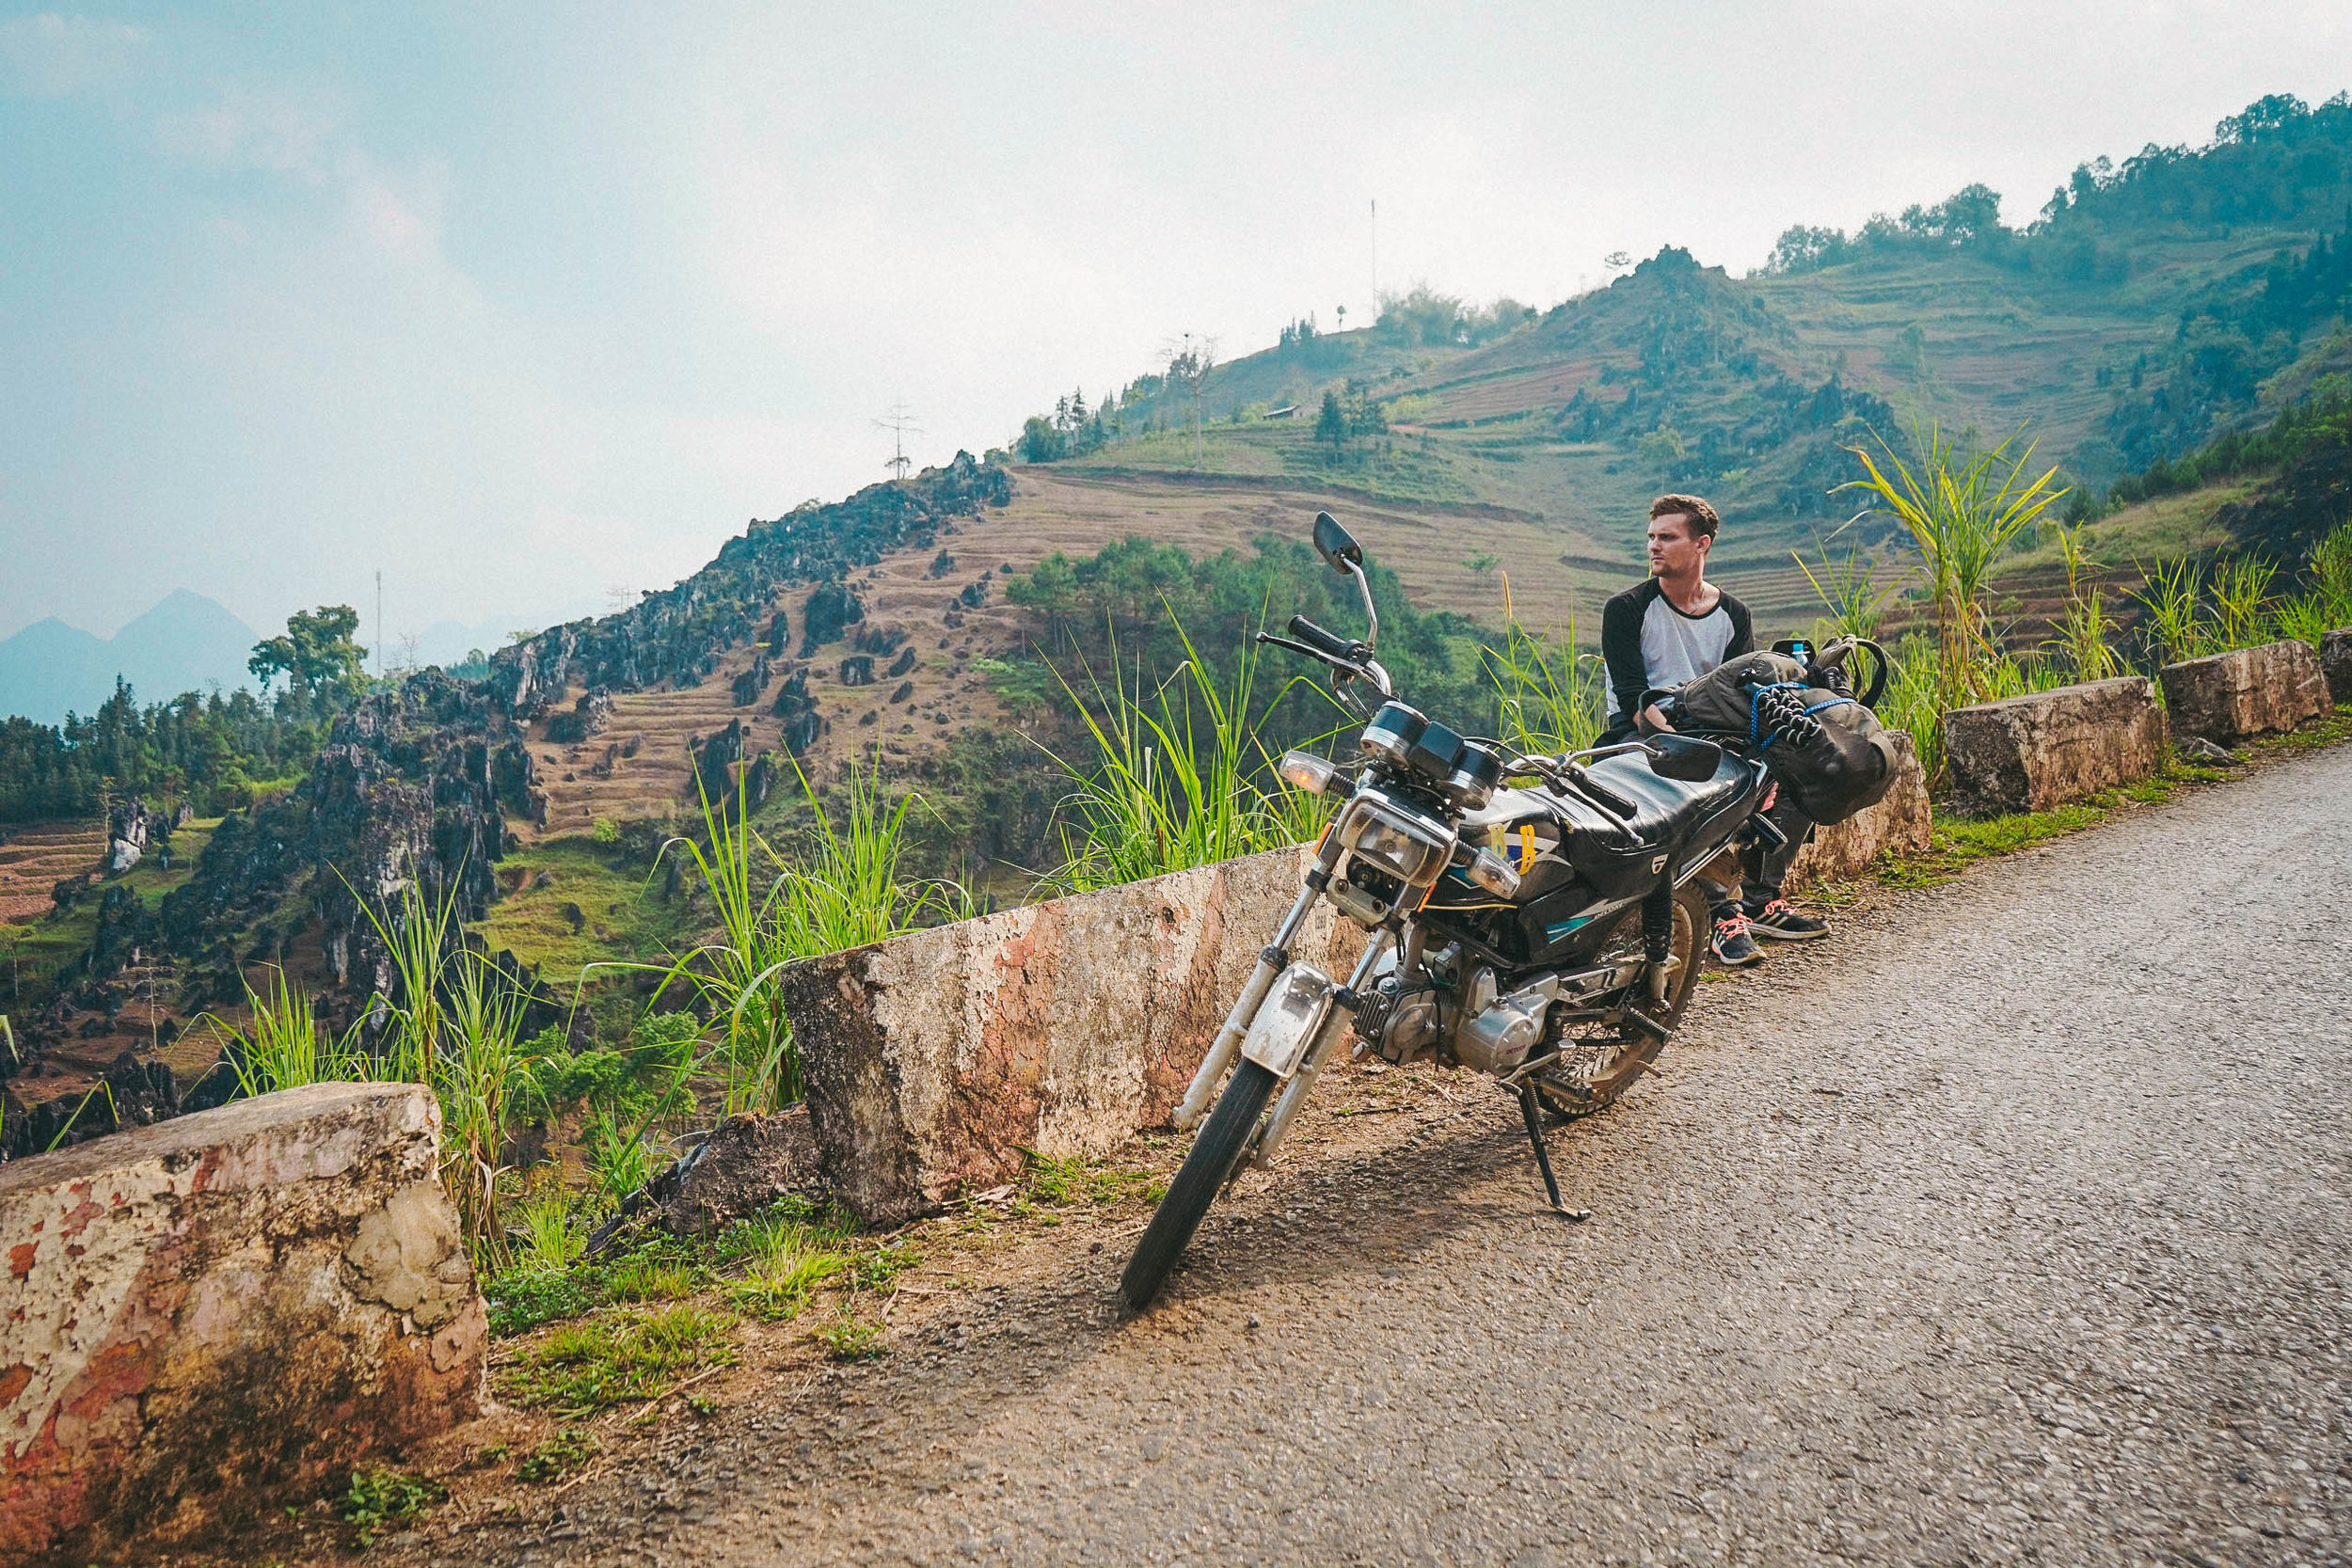 northvietnam-128.jpg